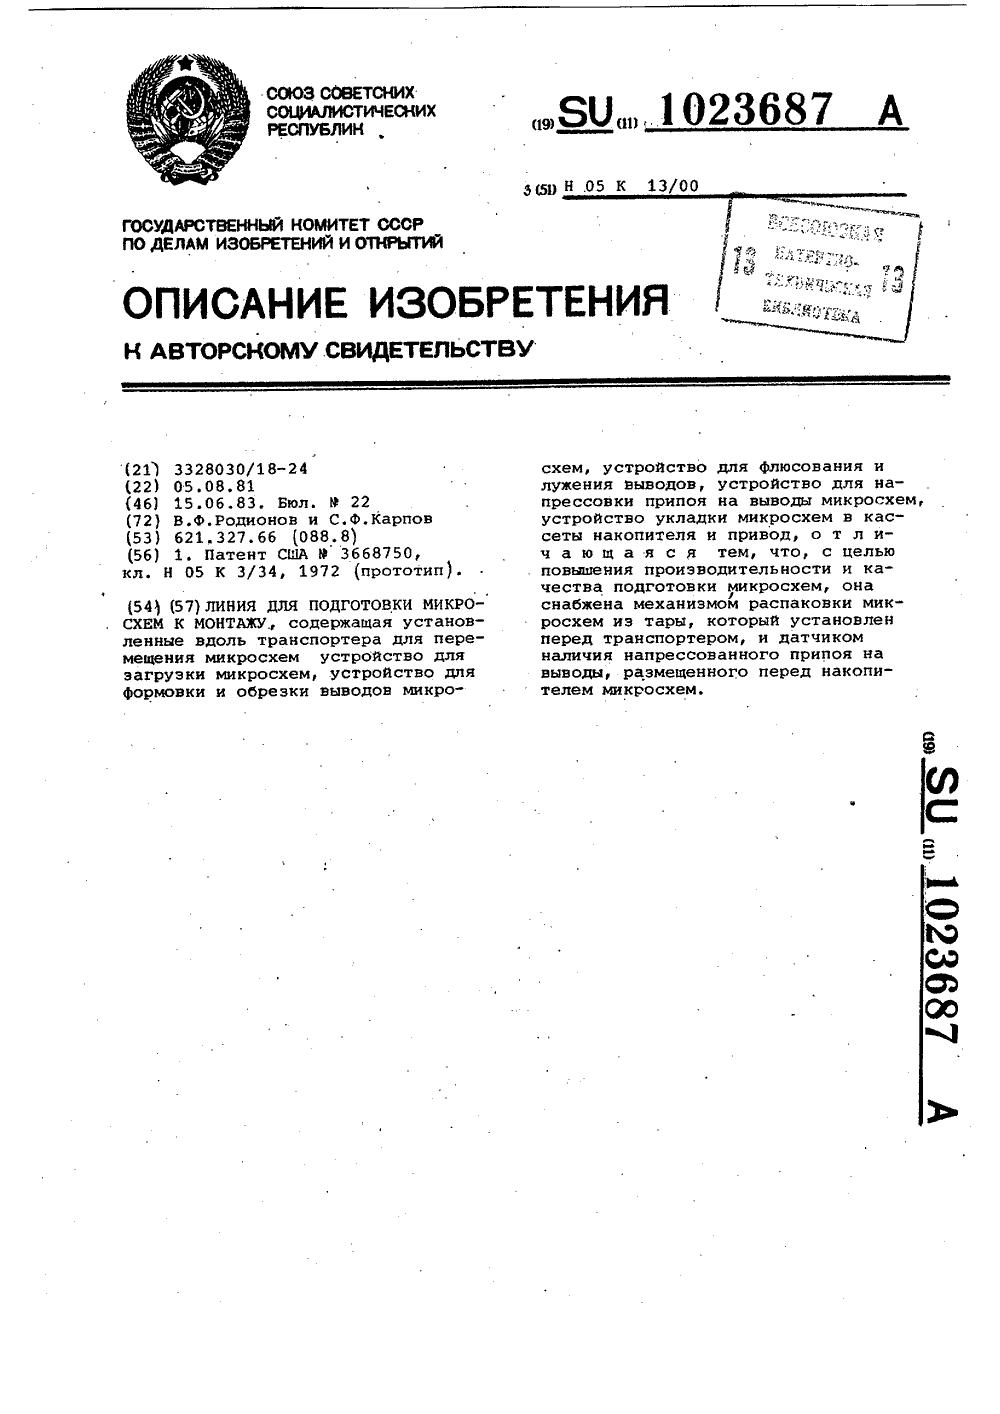 схема устройства п-327-12